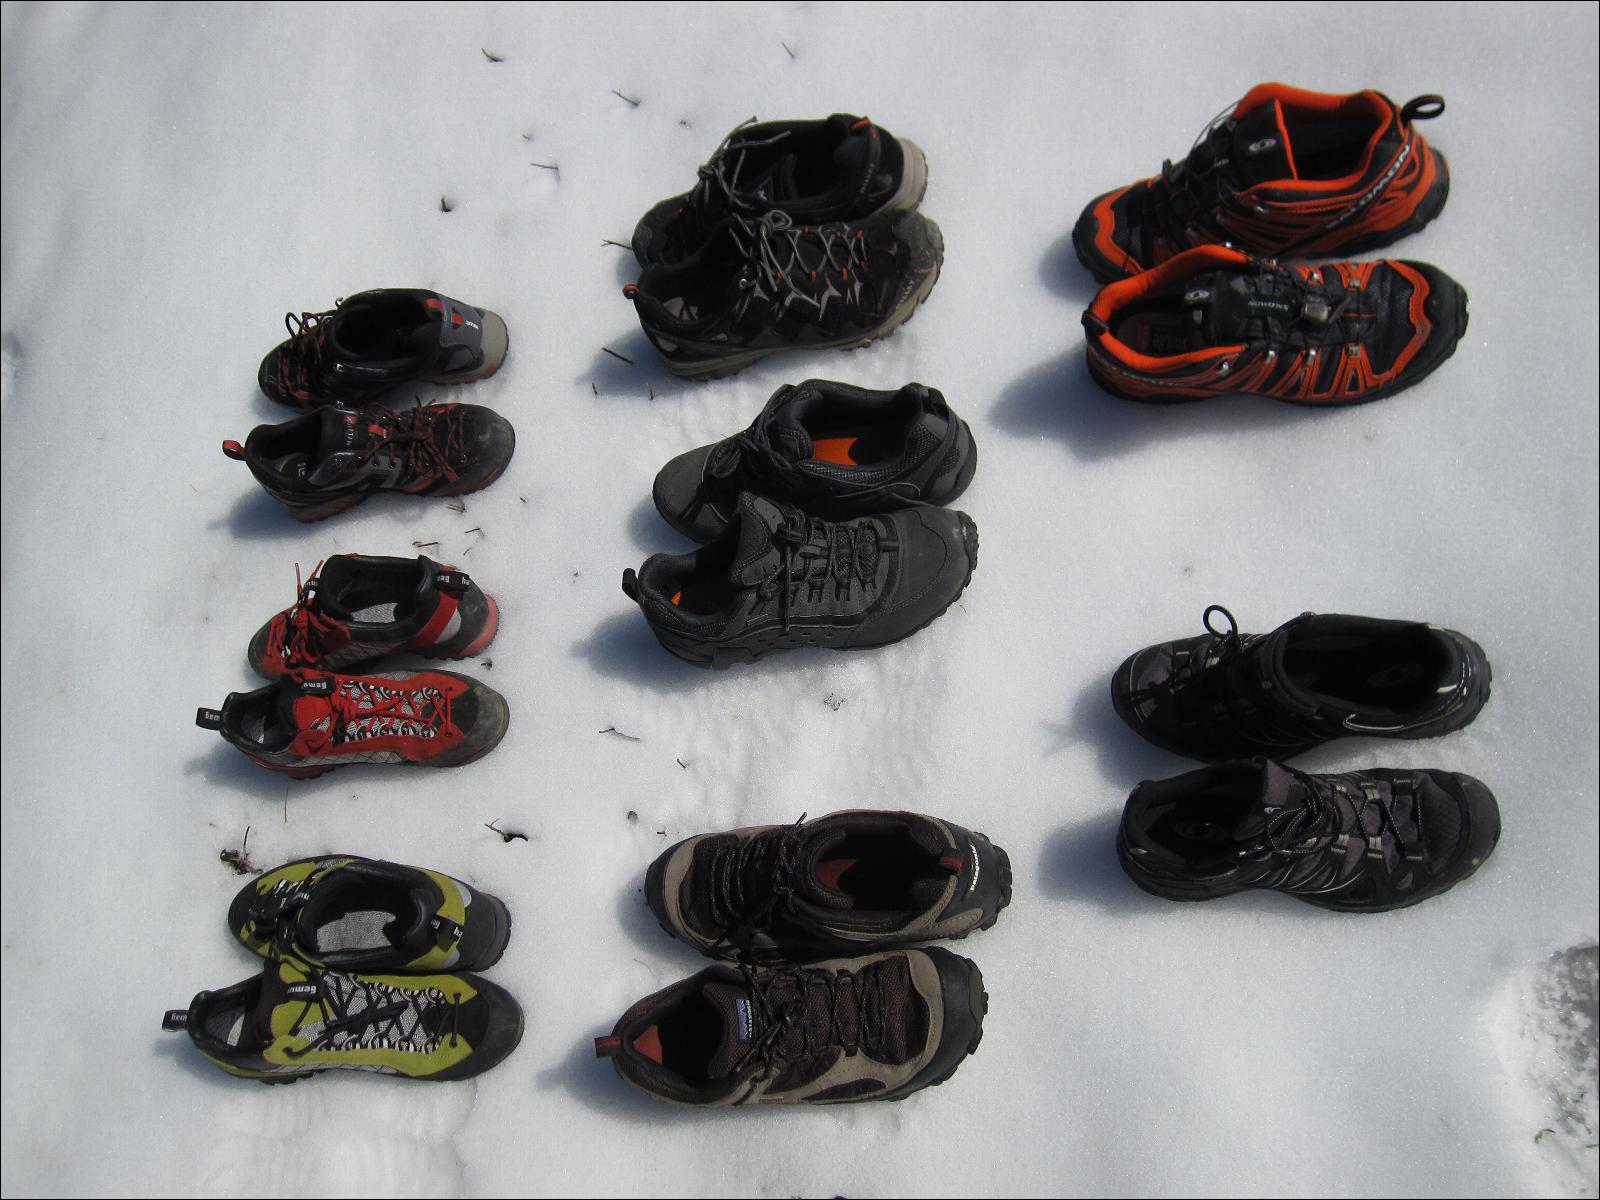 Basse Comparatif Tige Chaussures Tex Gore 5wrXYwEq